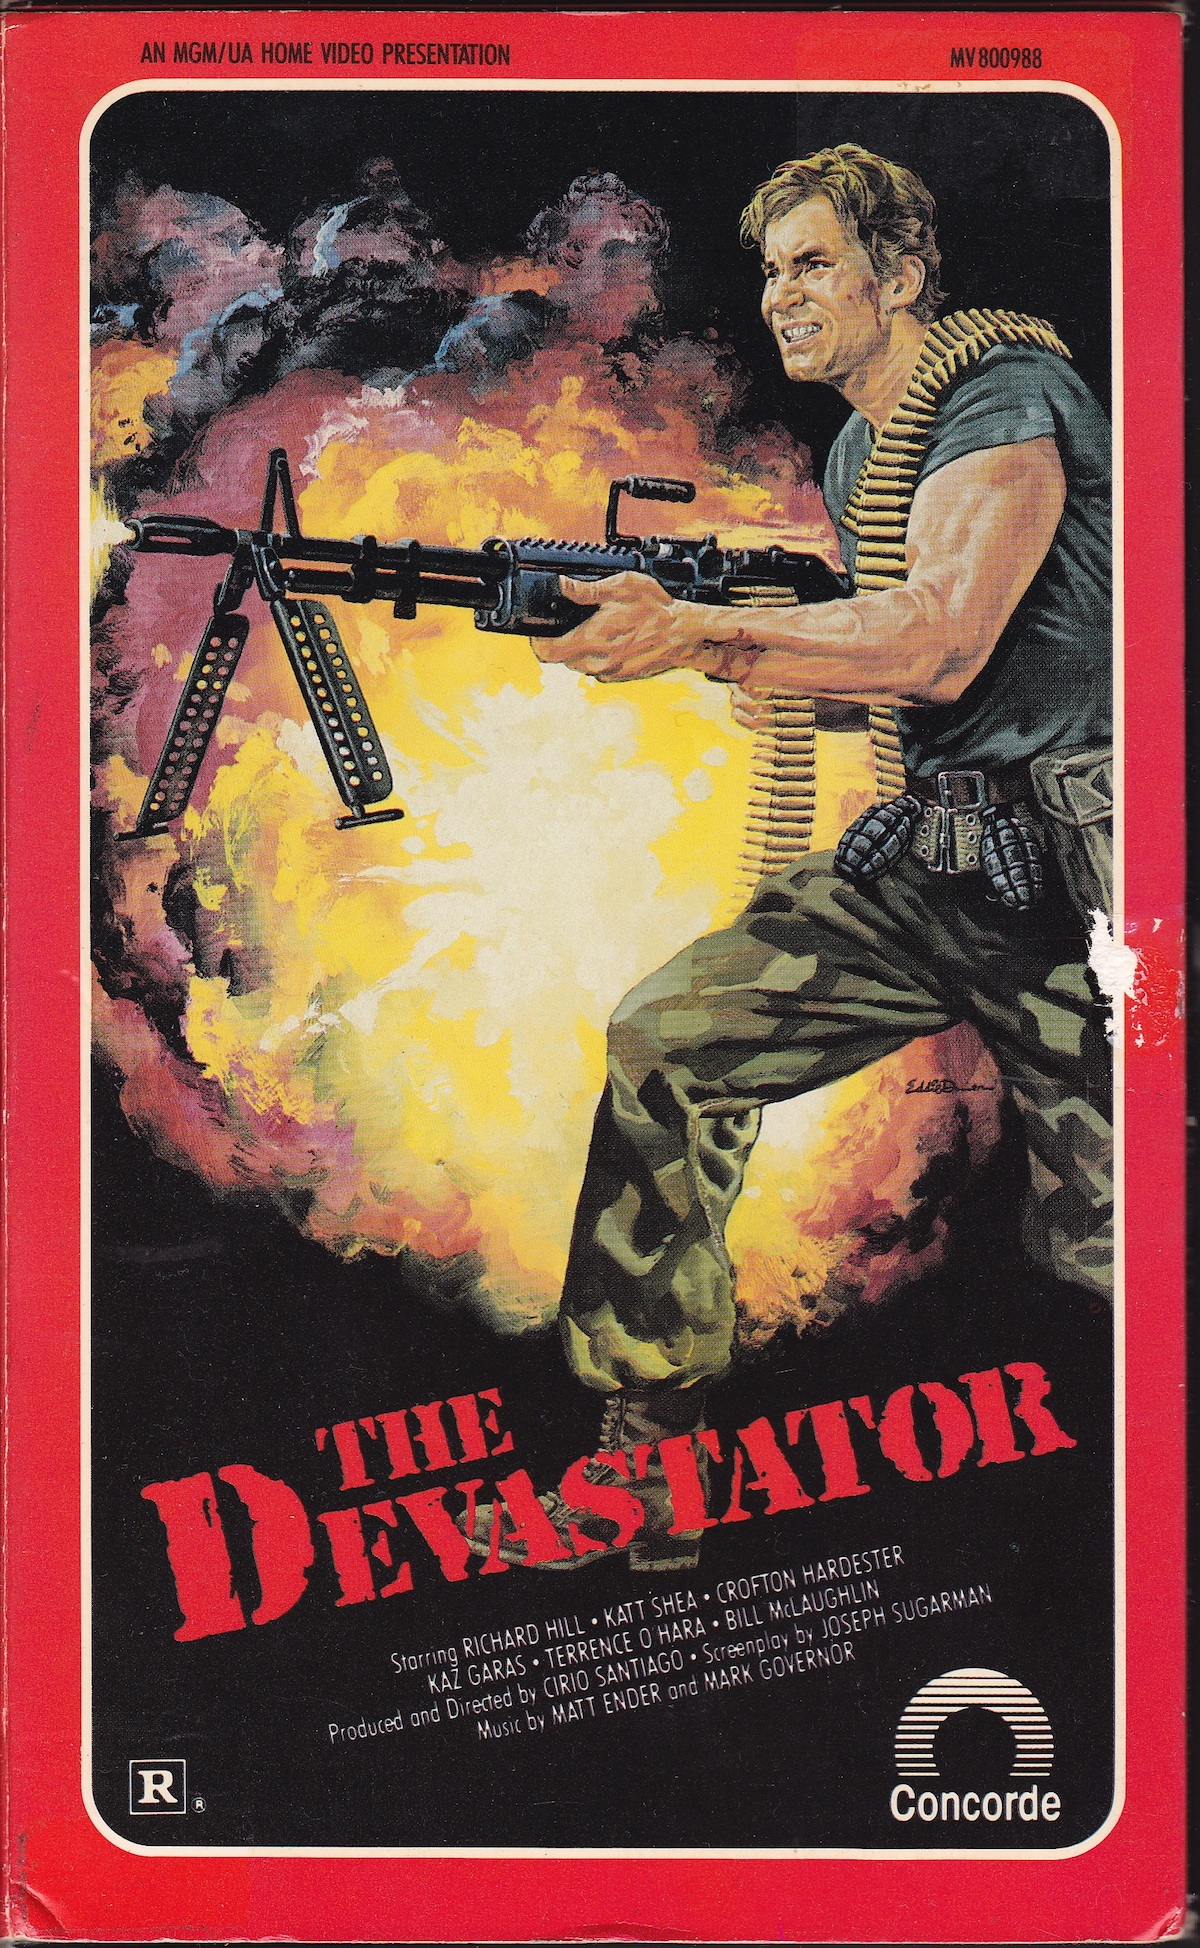 affiche du film The Destroyers